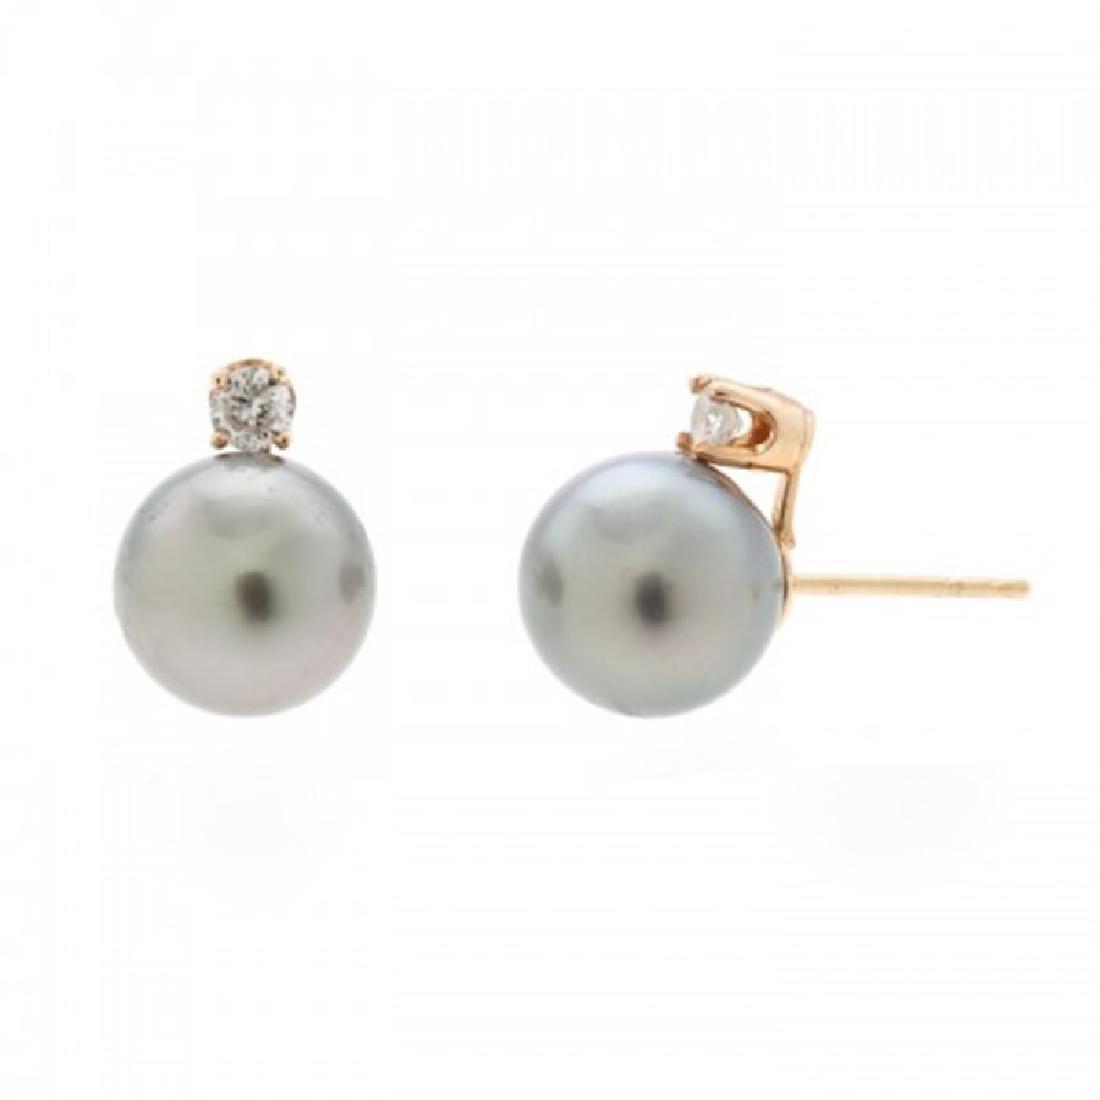 9.0-9.5mm Tahitian Pearl Earrings with Diamond